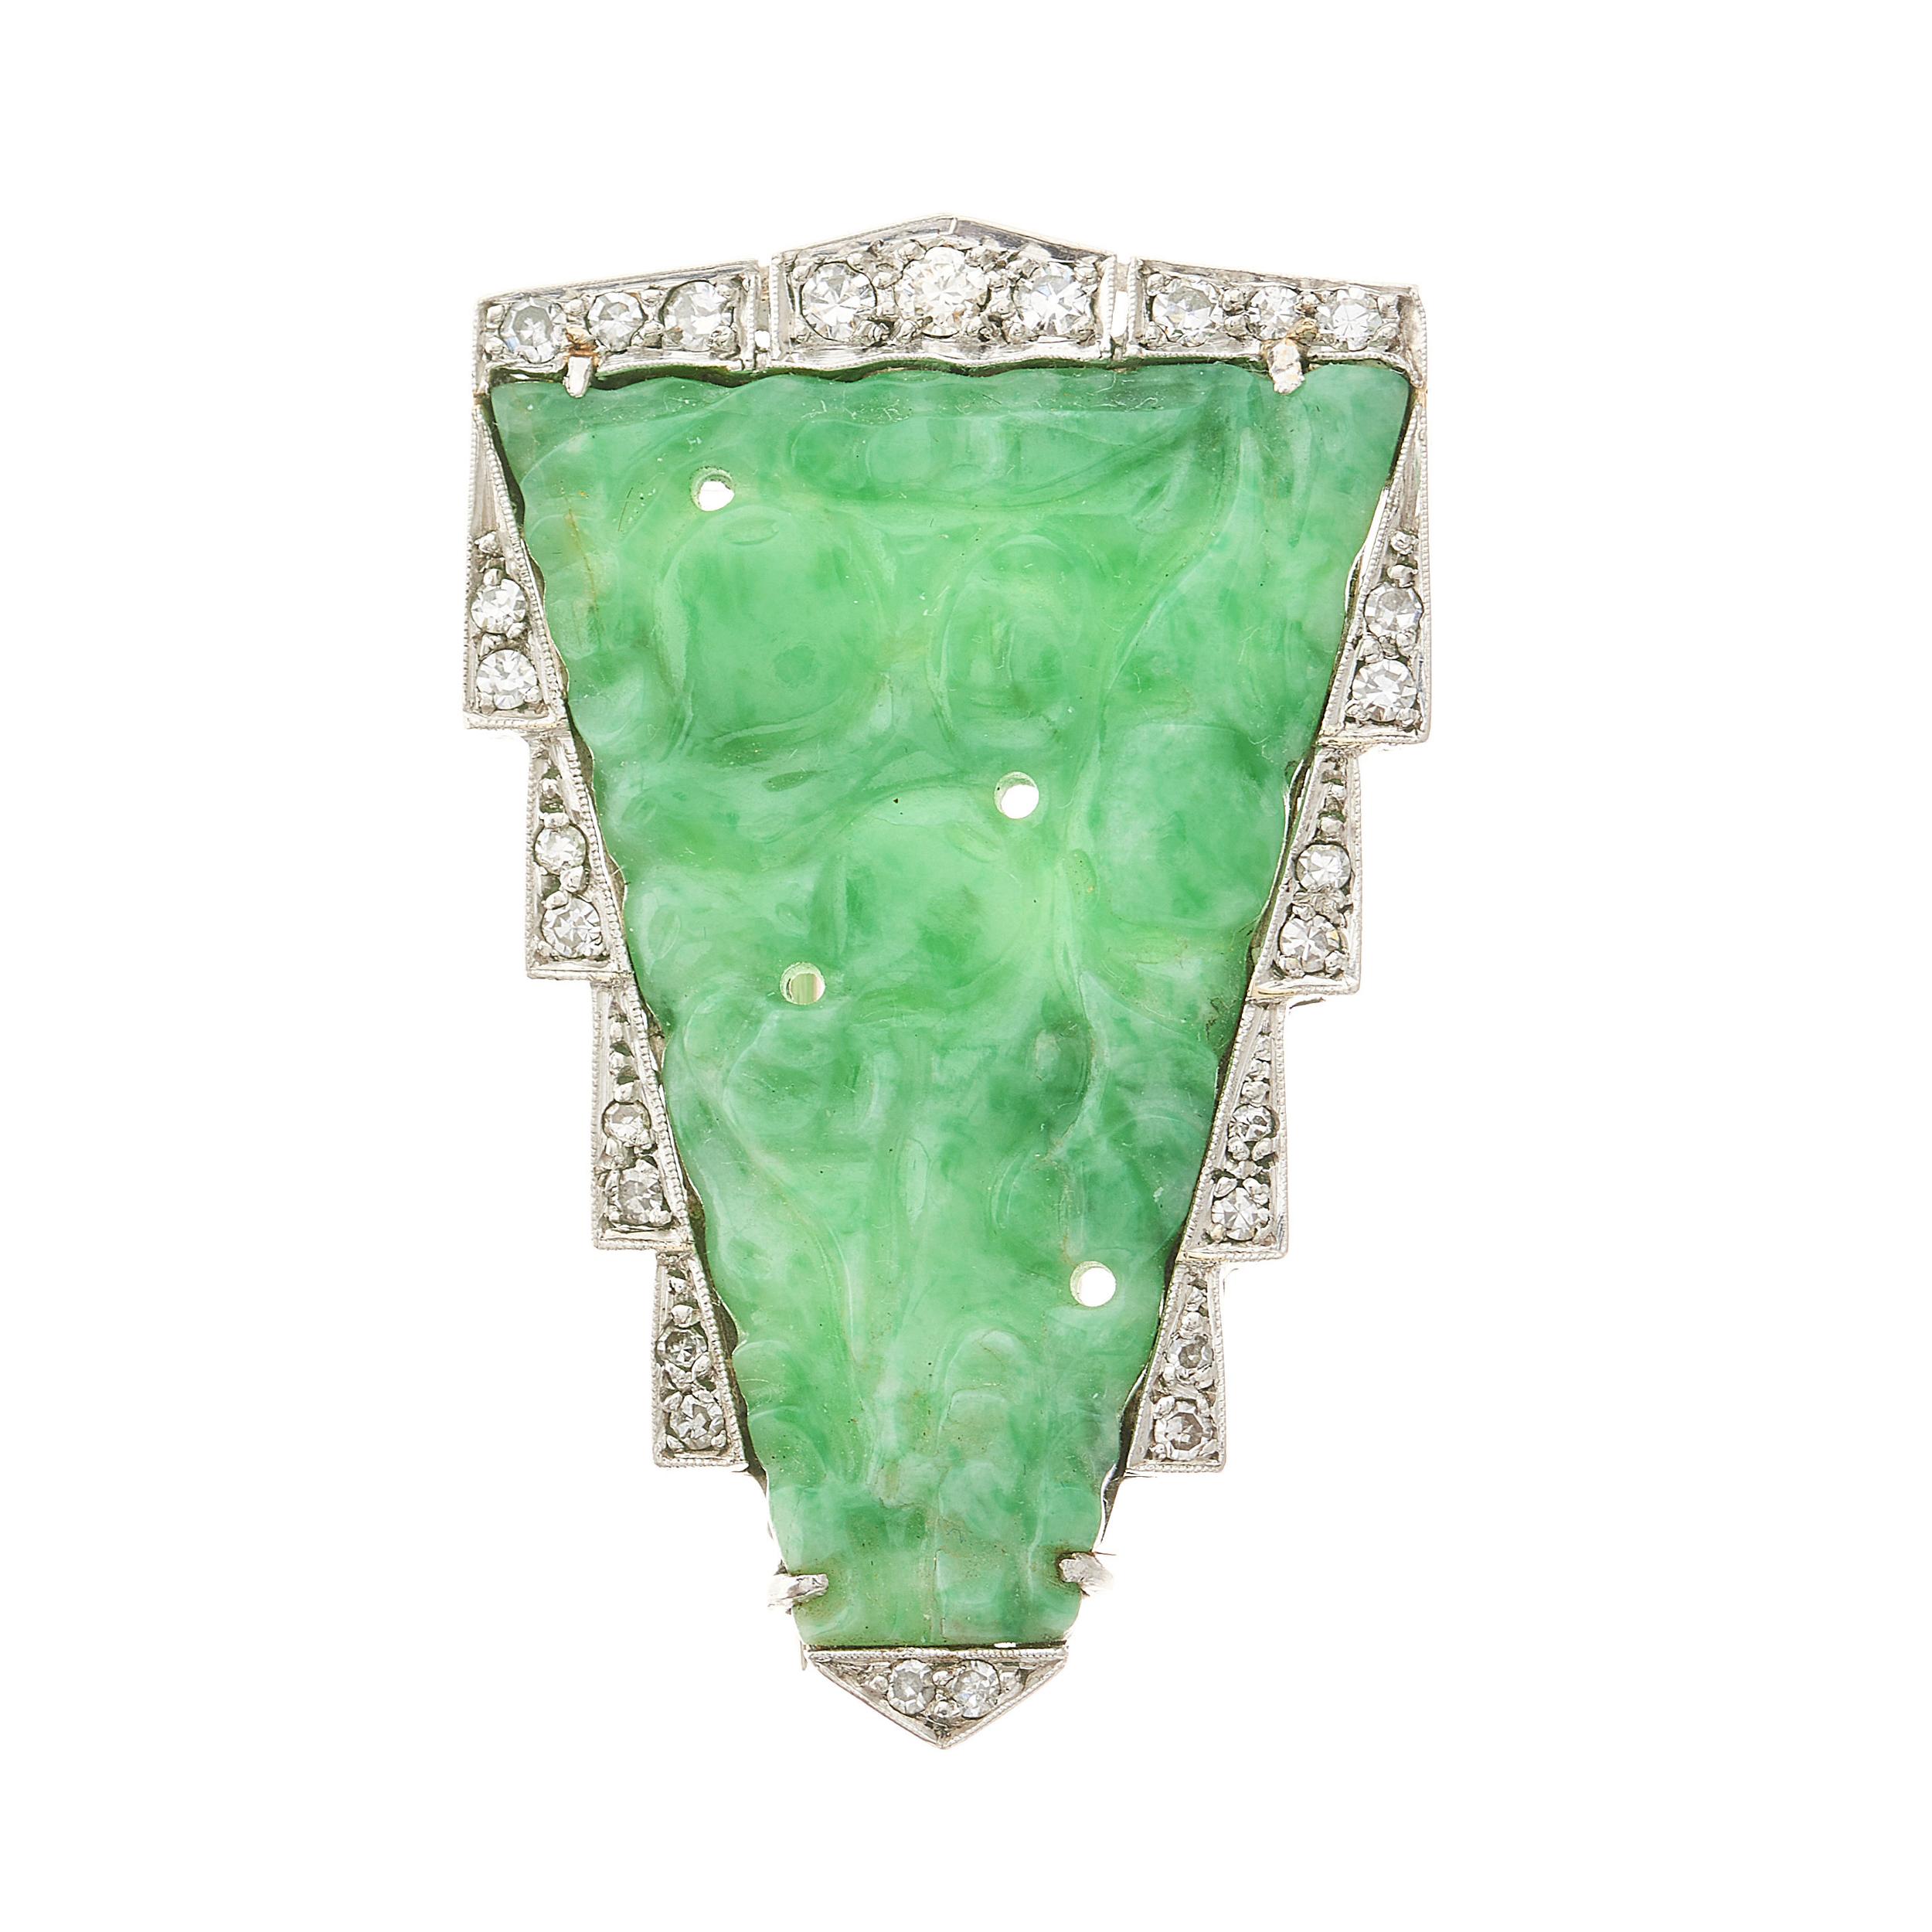 An Art Deco natural jadeite jade and diamond brooch